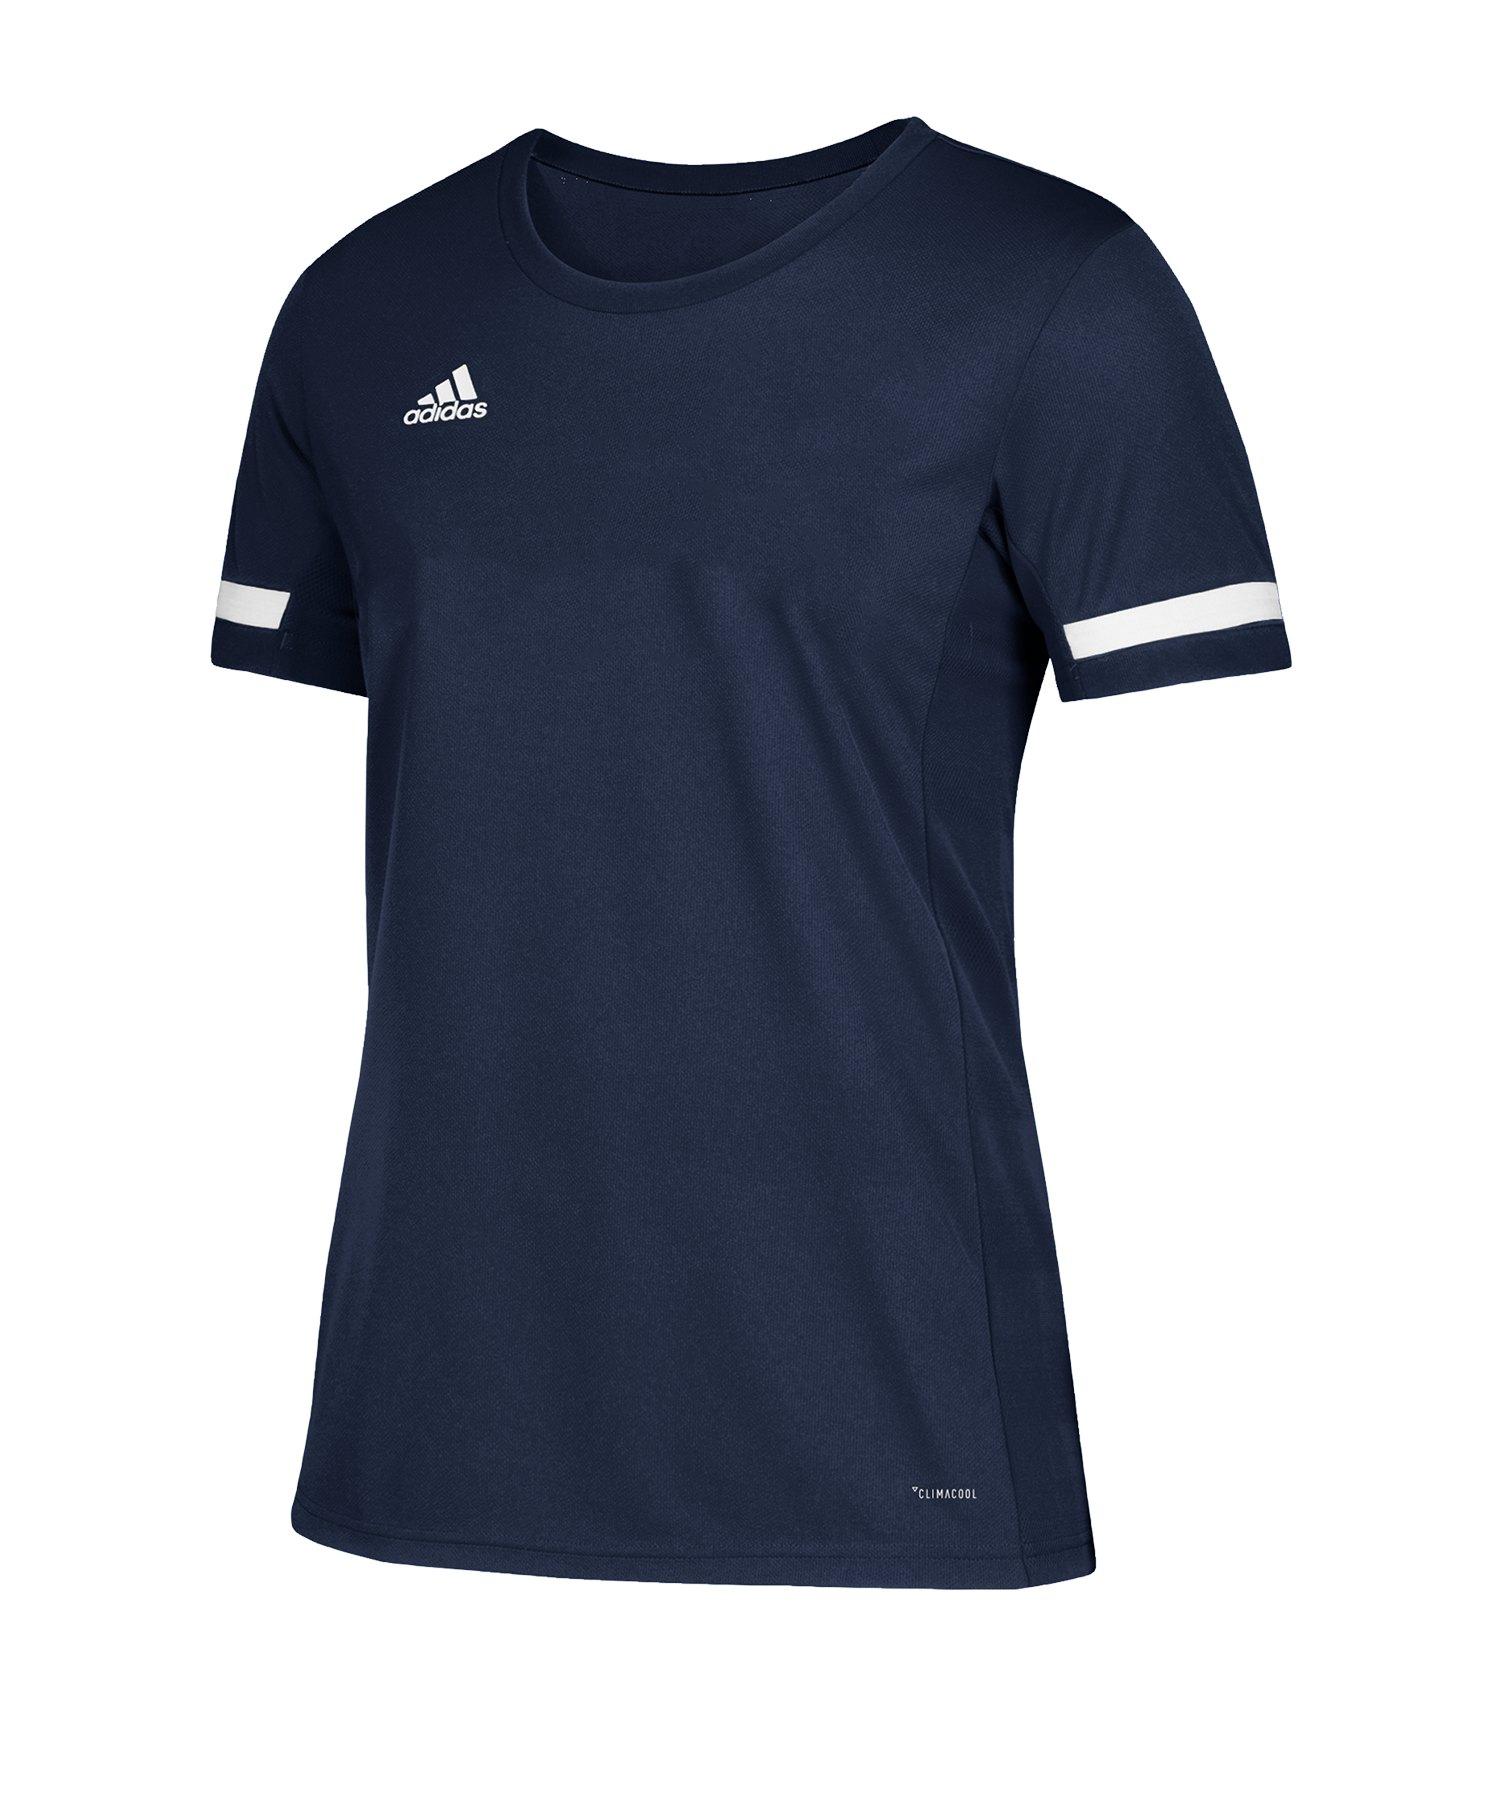 adidas Team 19 Trikot kurzarm Kids Blau Weiss - blau